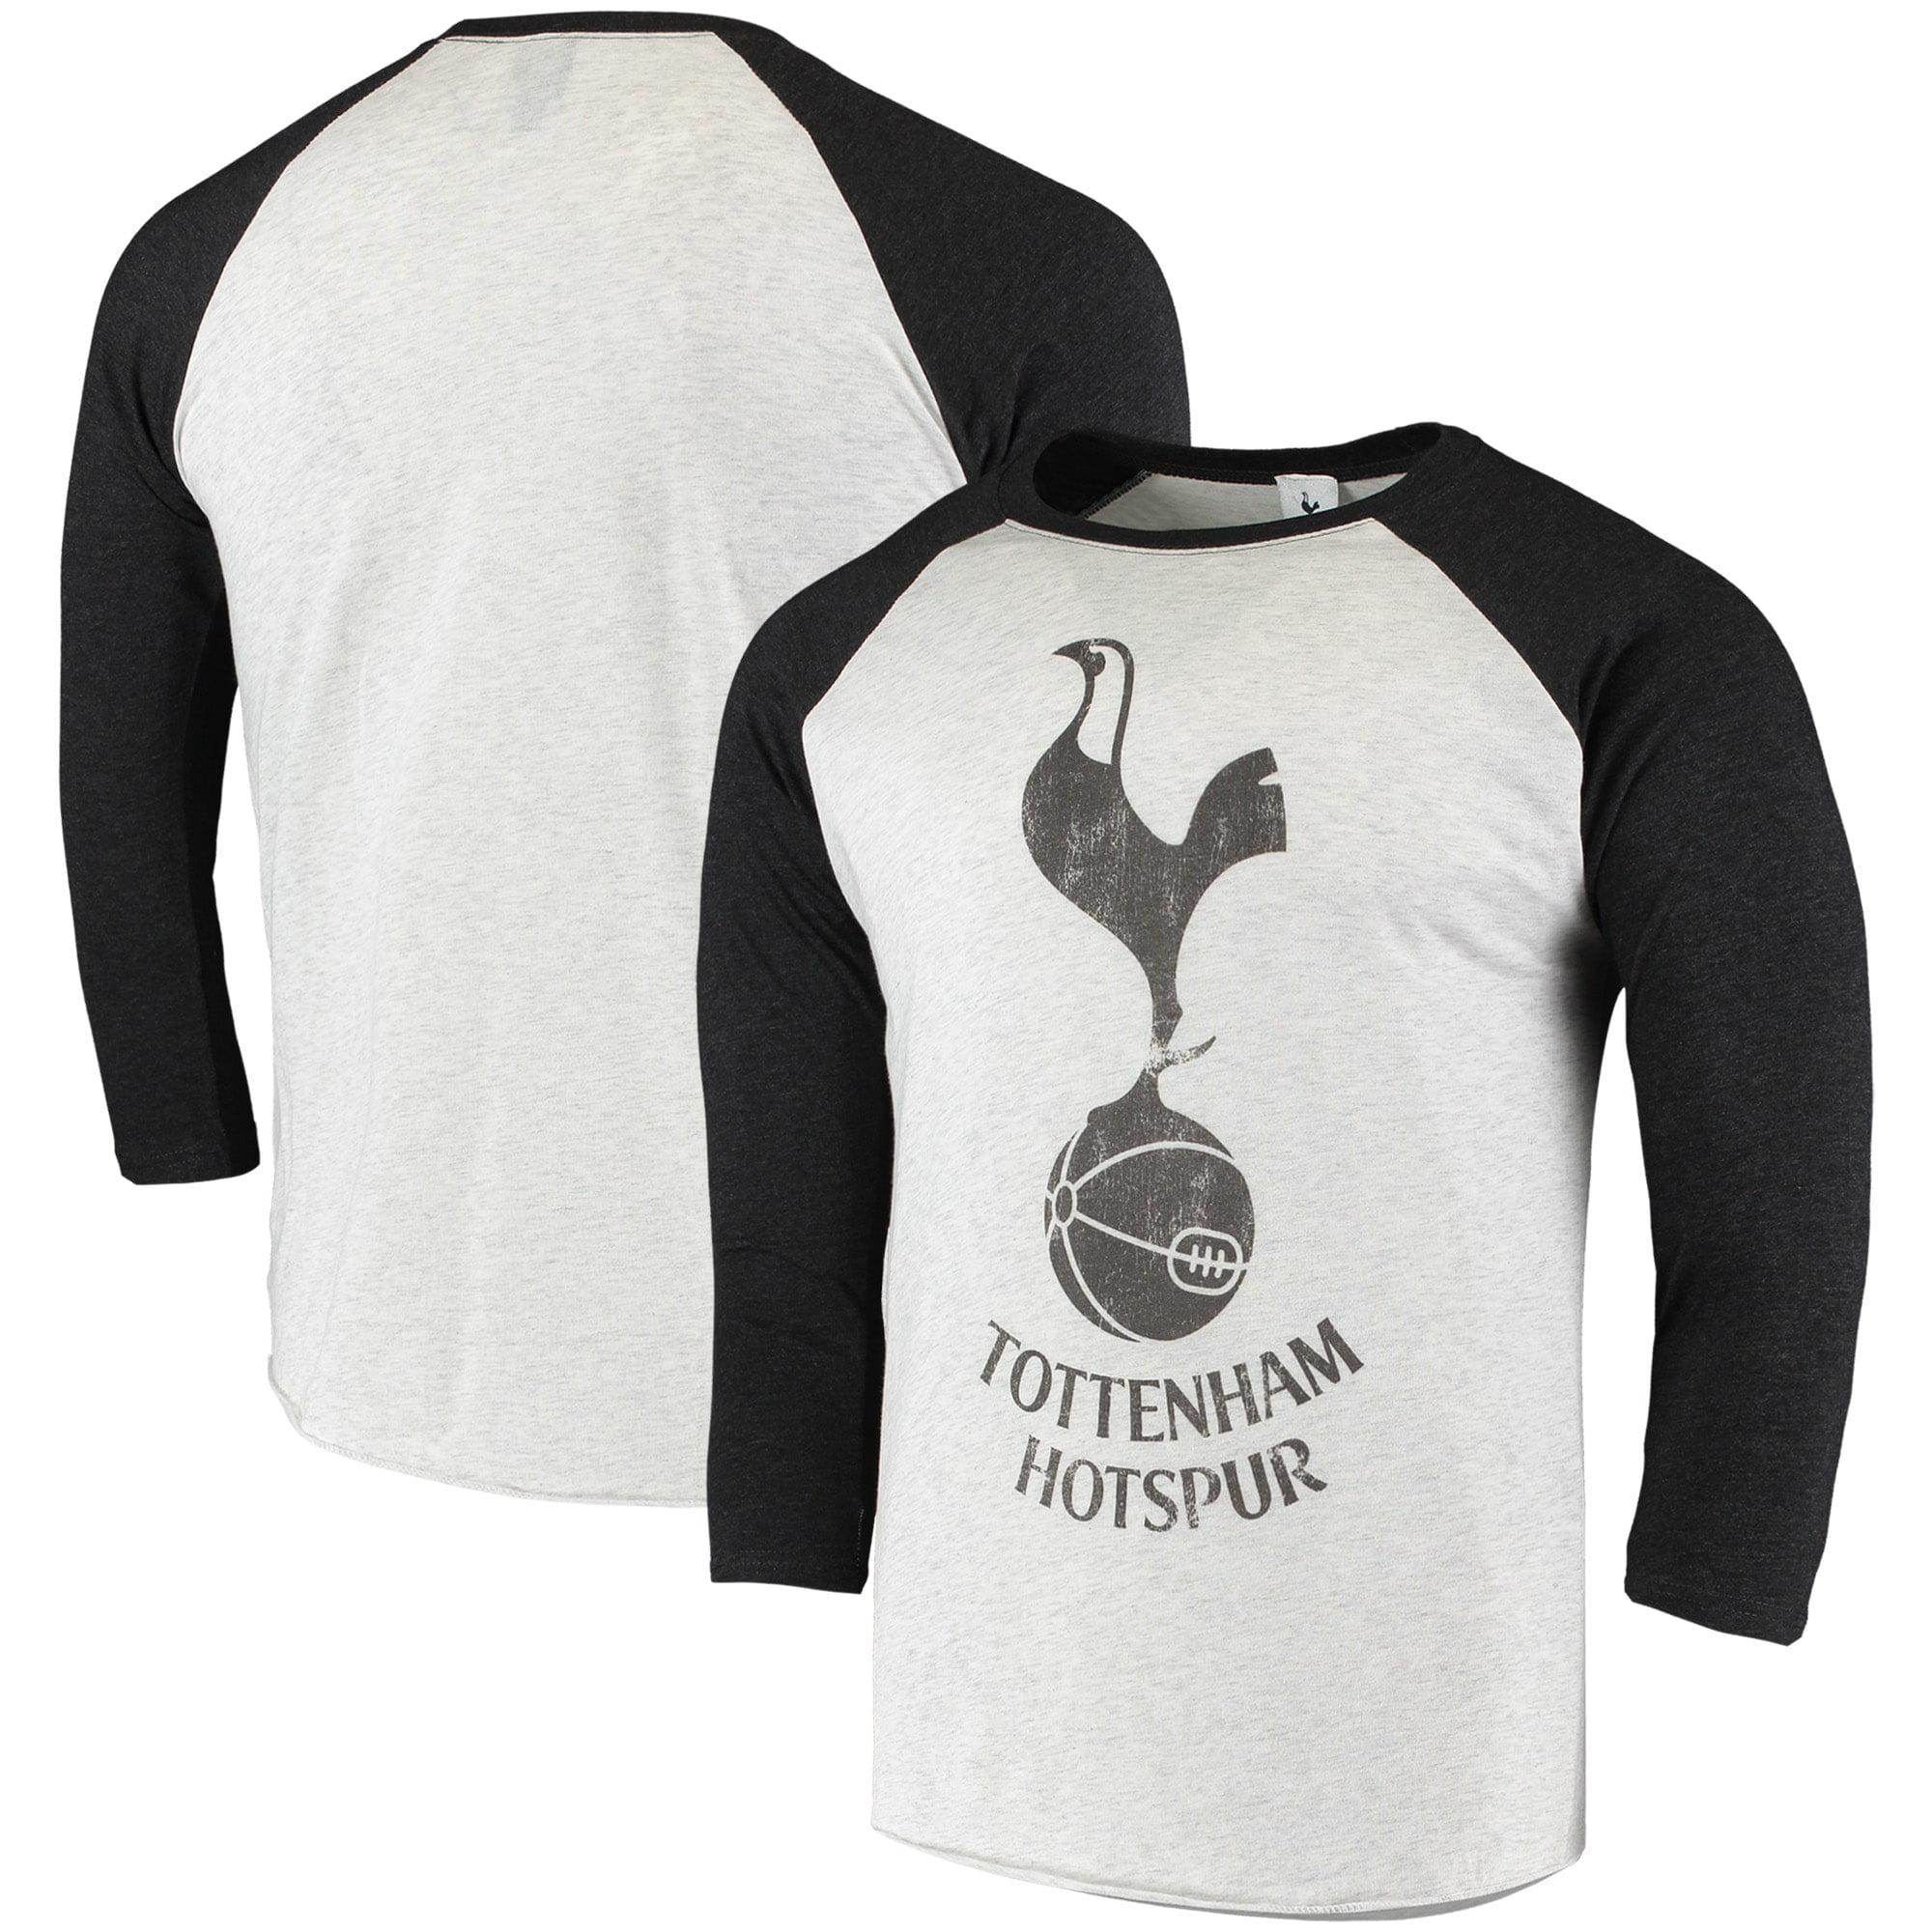 Fifth Sun Tottenham Hotspur Primary Logo Tri Blend Raglan T Shirt White Black Walmart Com Walmart Com